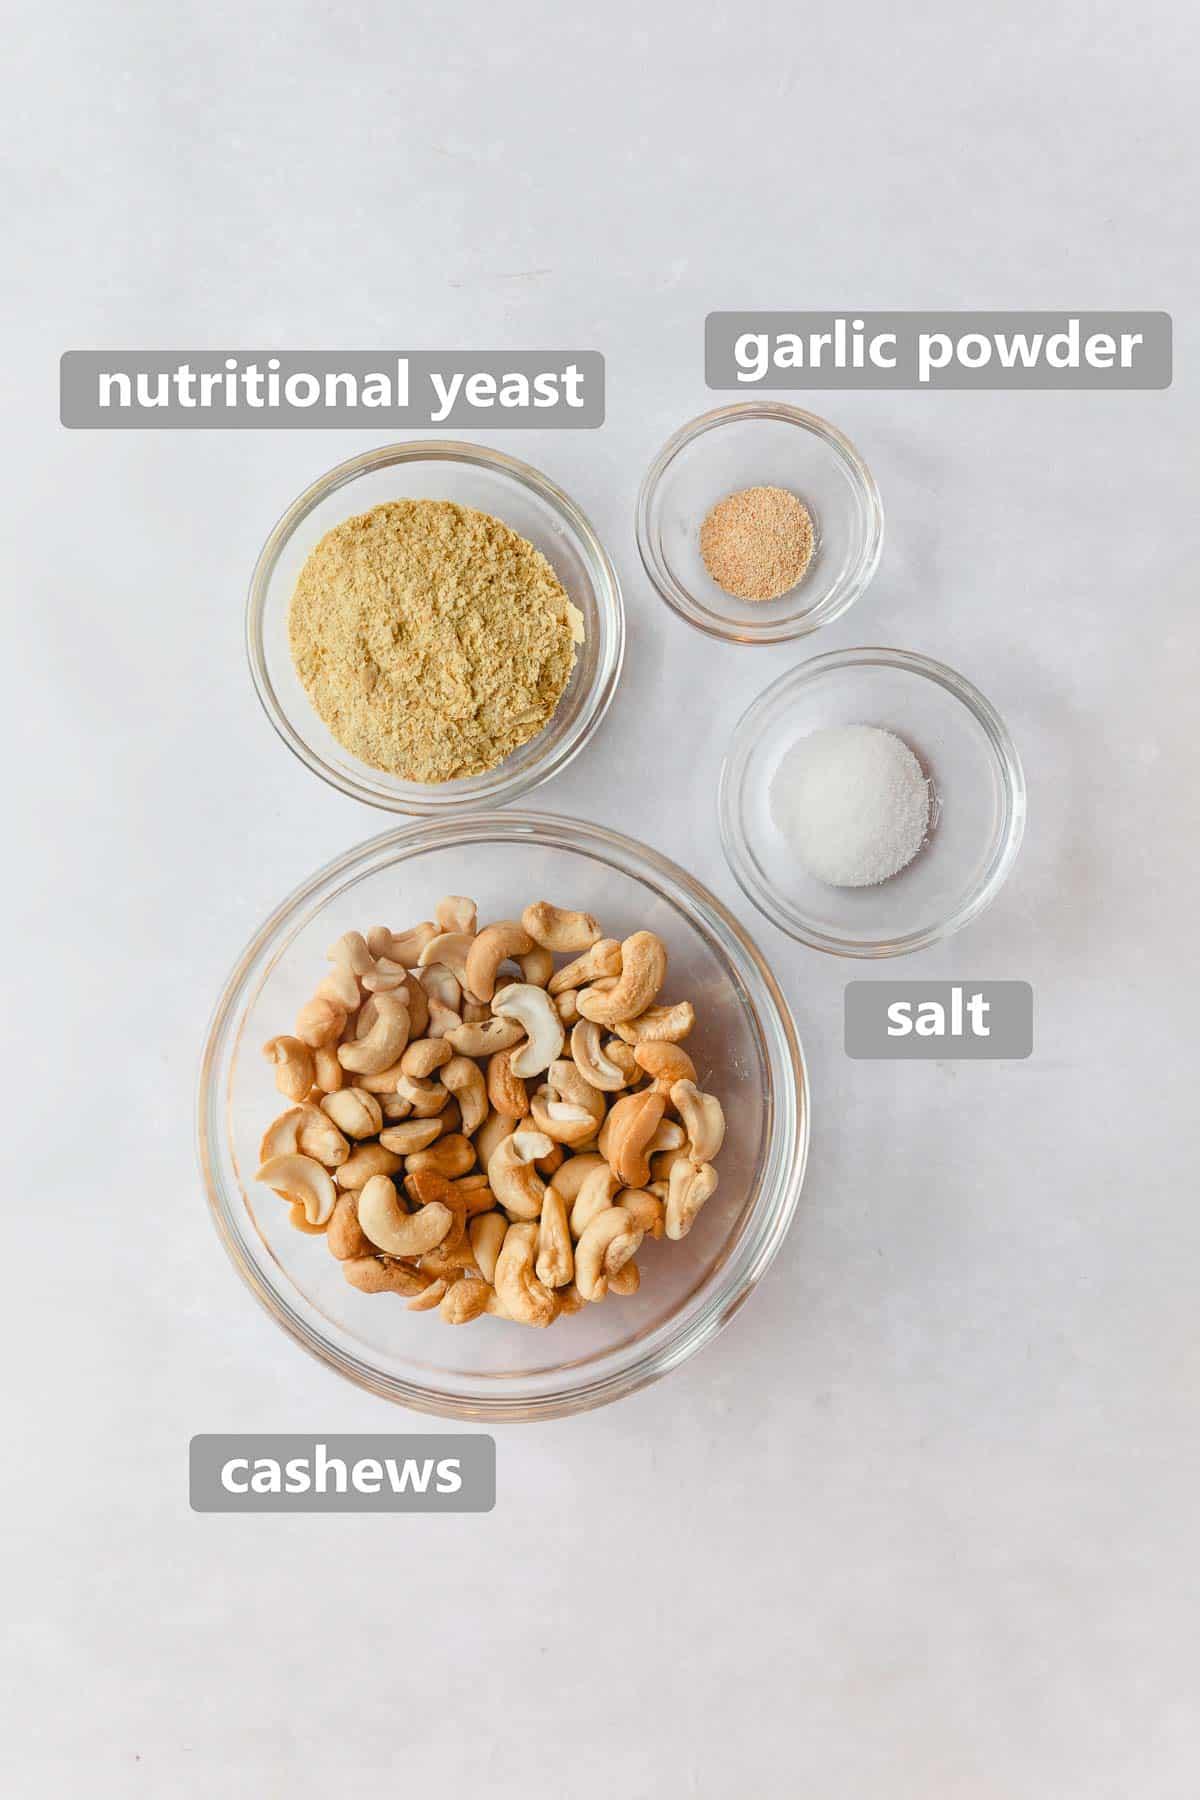 ingredients to make dairy-free parmesan cheese